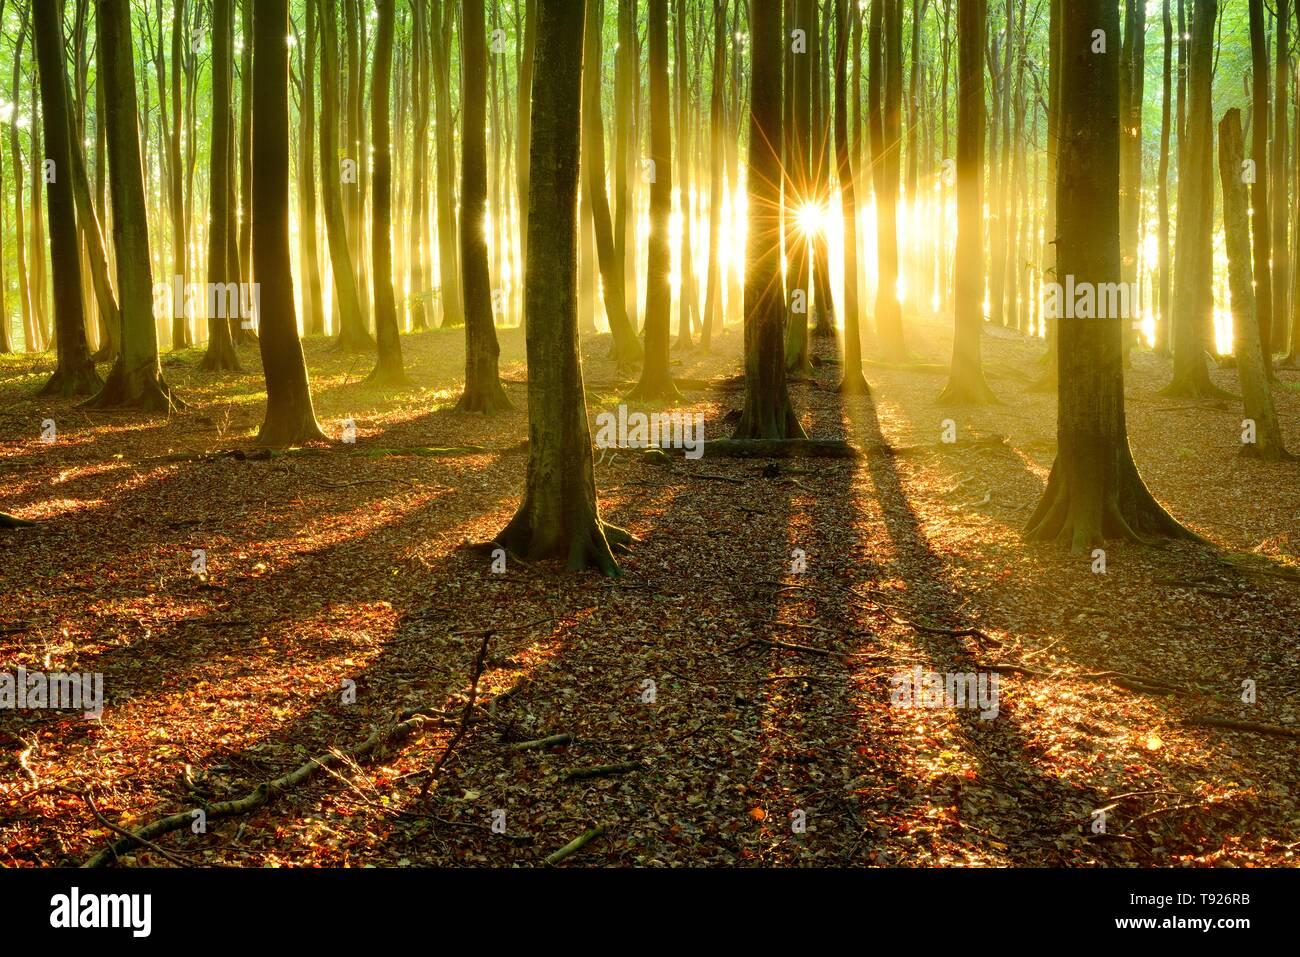 Sun shines brightly through natural beech forest (Fagus sp.), Stubnitz, Jasmund National Park, island Rugen, Mecklenburg-Western Pomerania, Germany - Stock Image